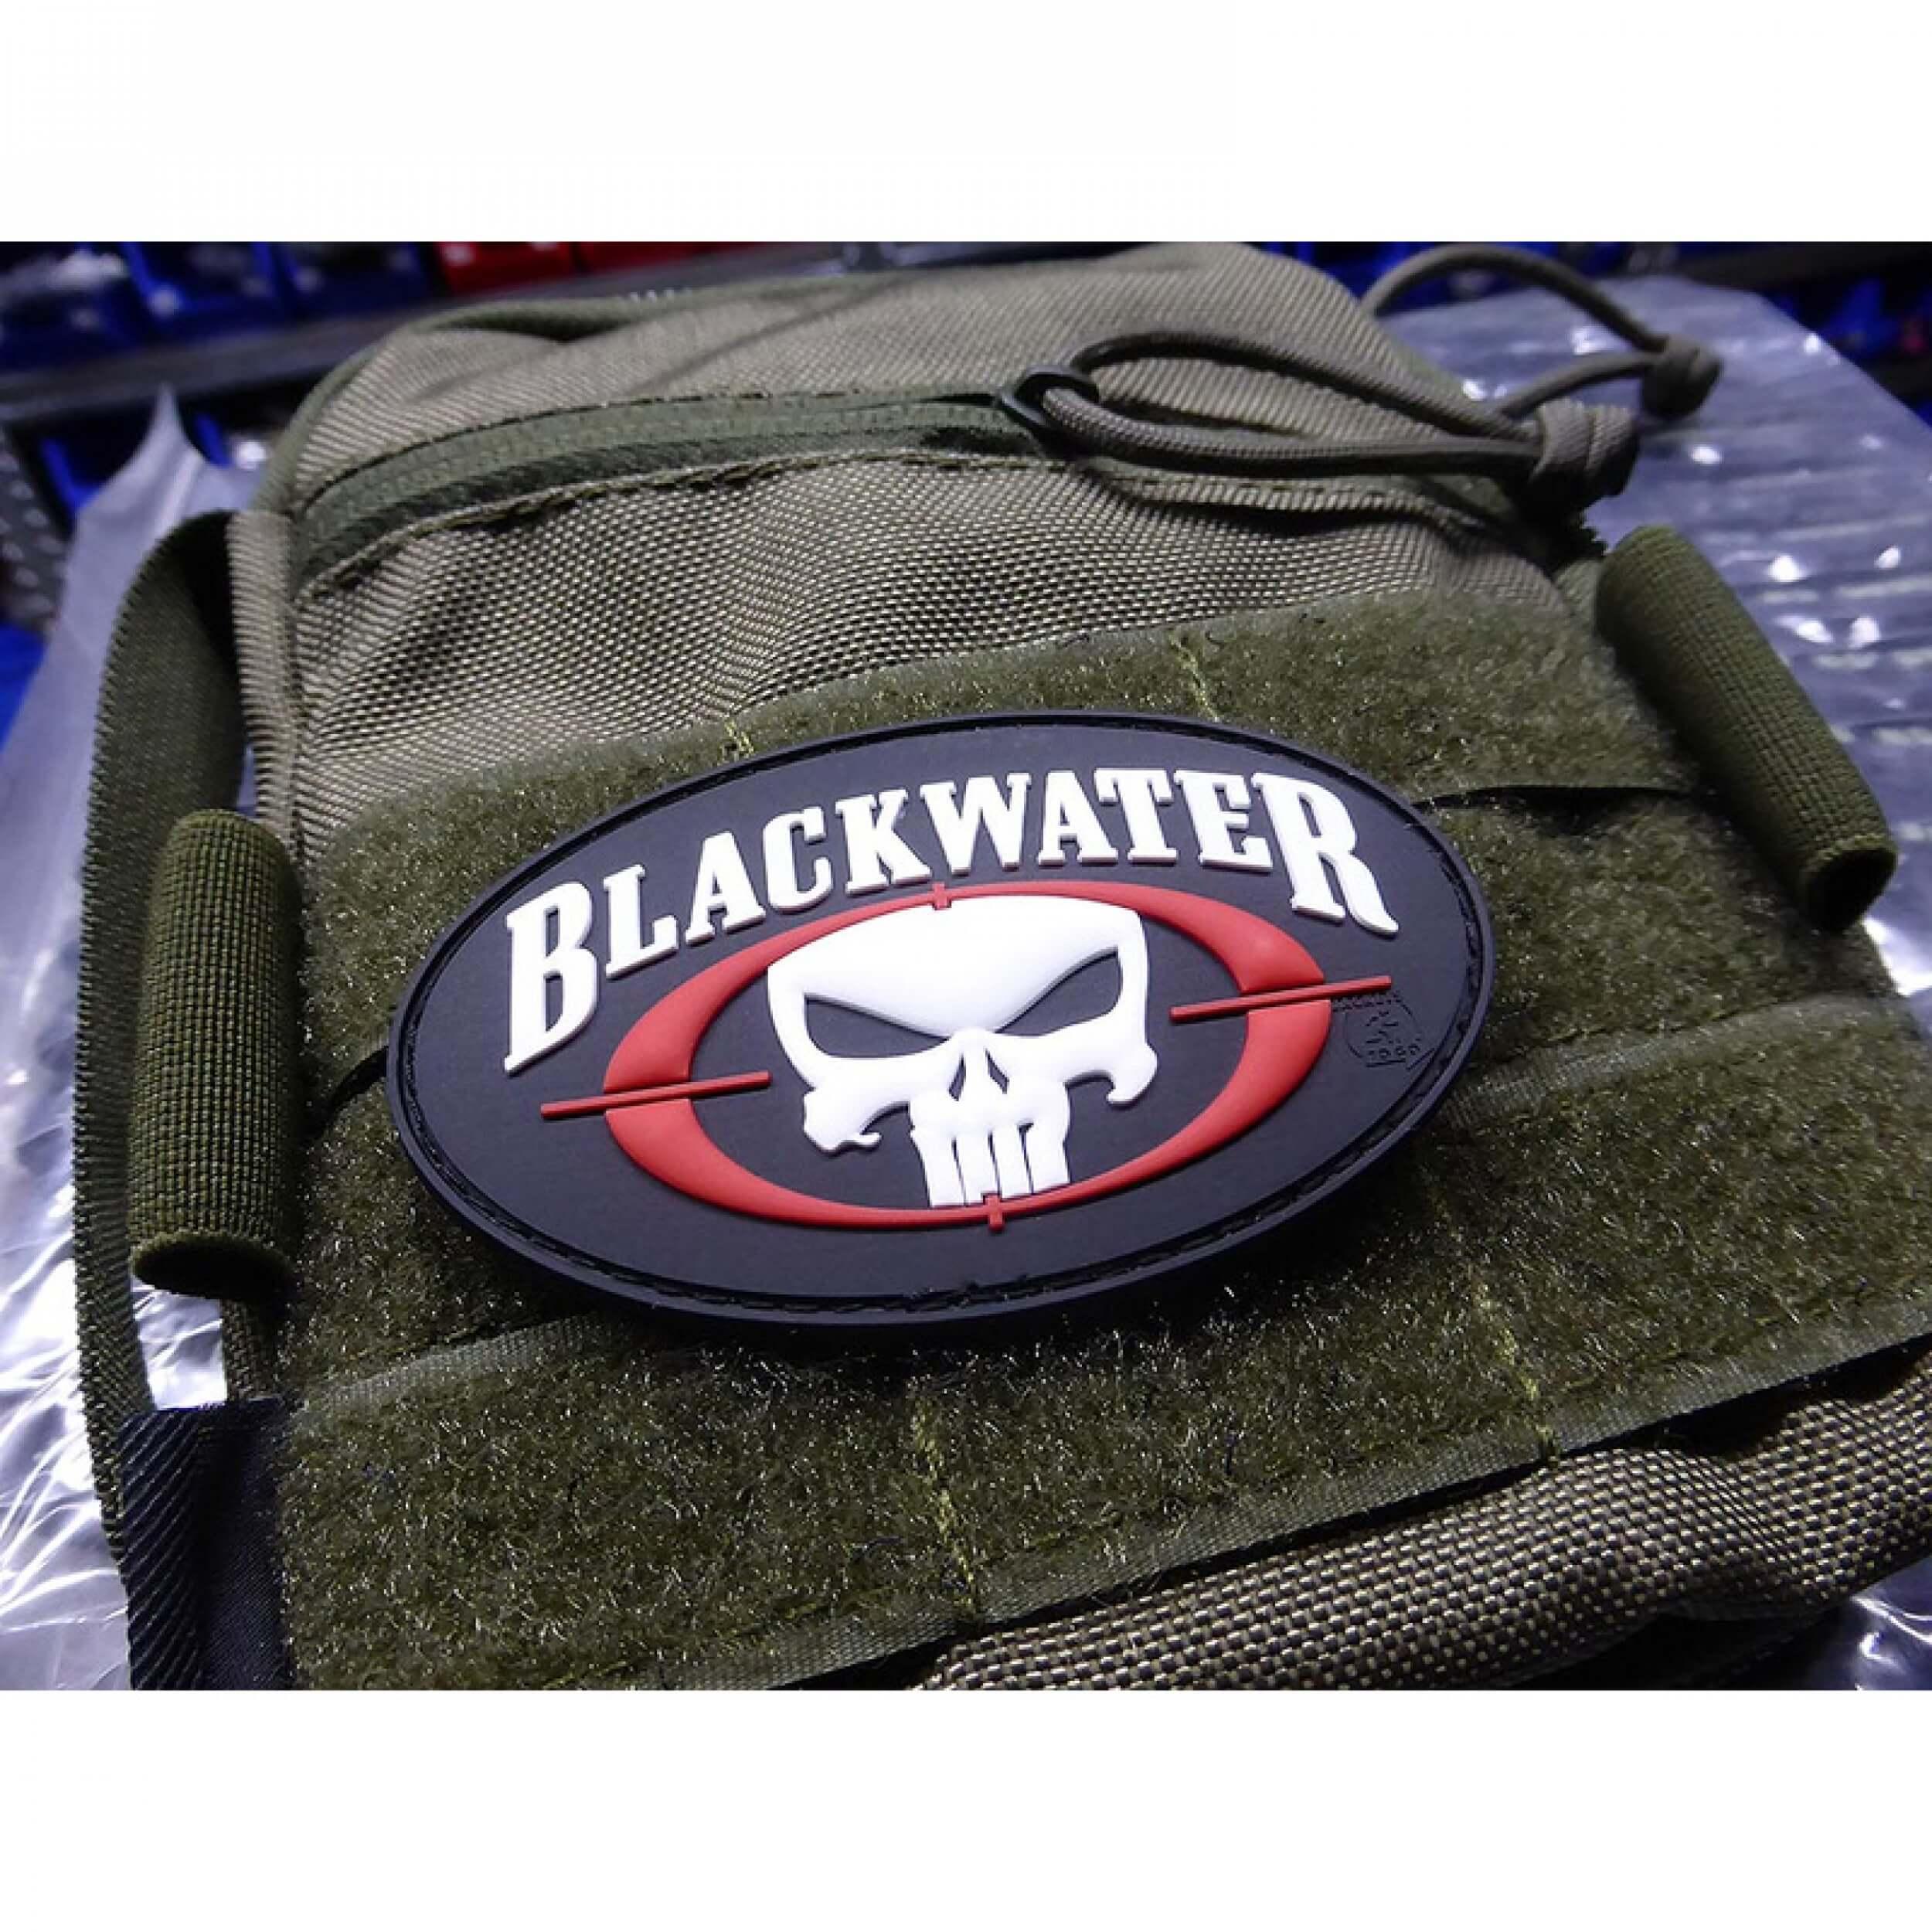 JTG BWP Blackwater Punisher Patch